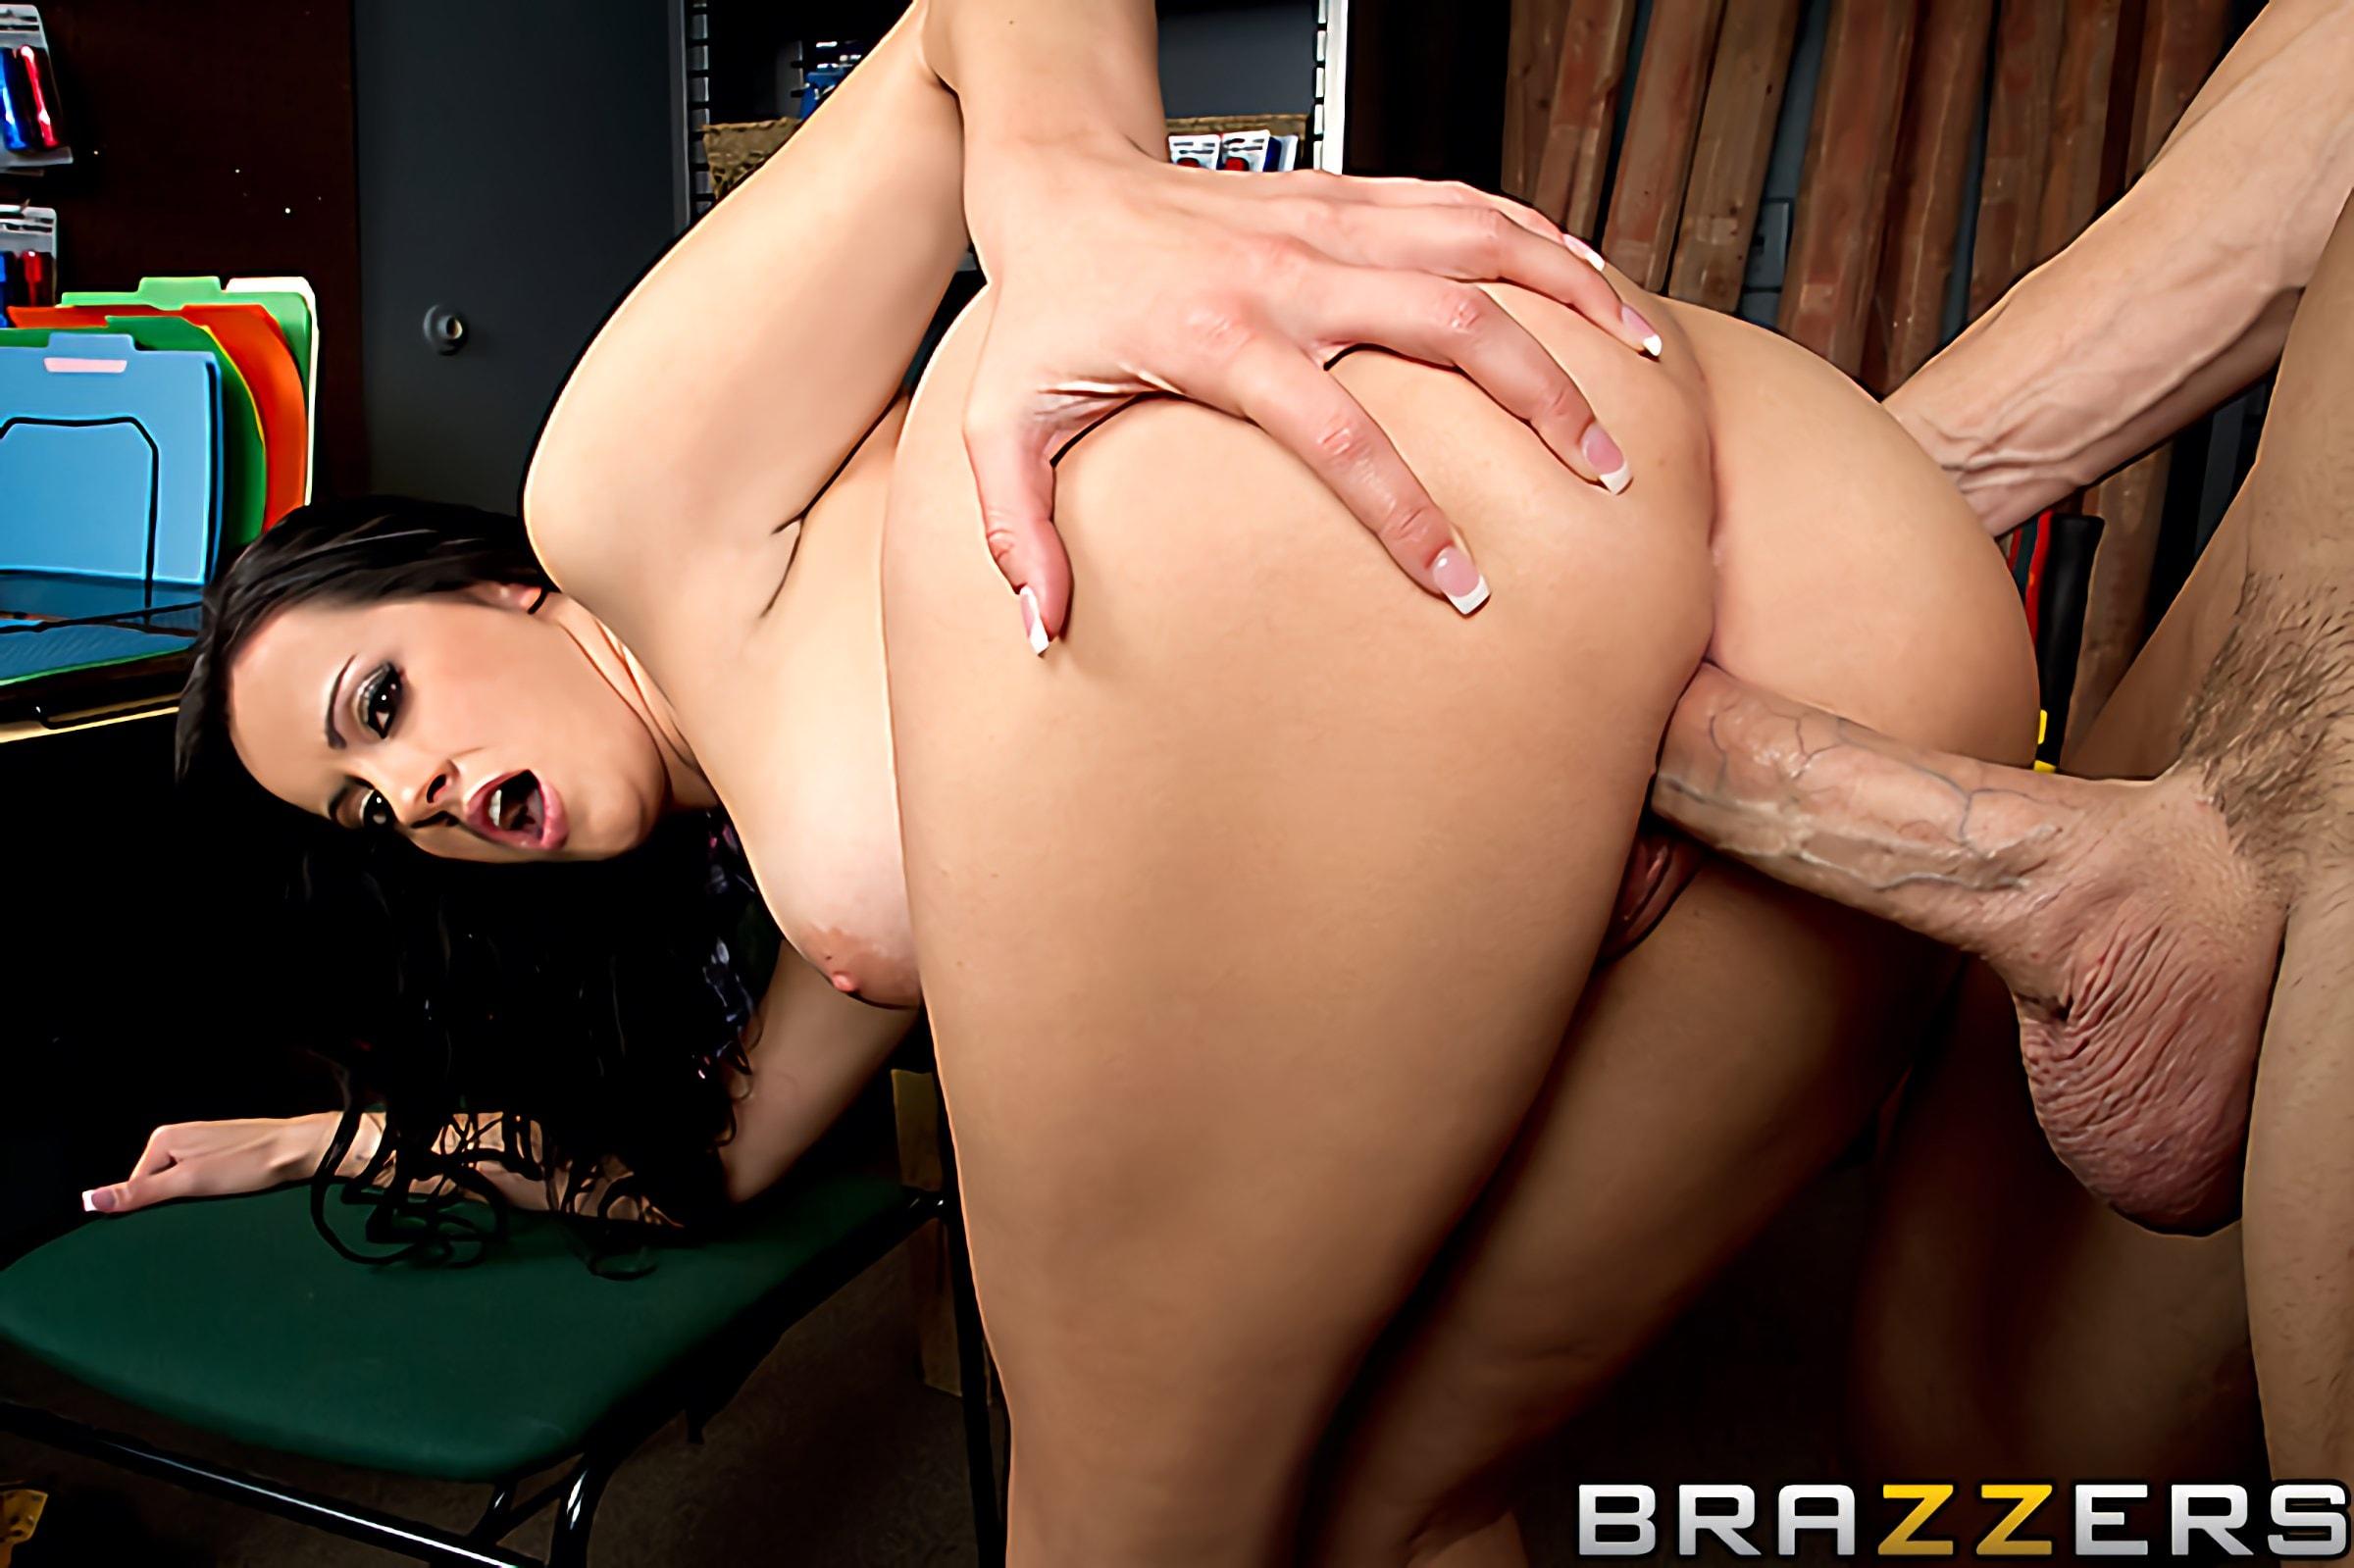 Brazzers 'Ho Hardware' starring Mandy Haze (Photo 11)